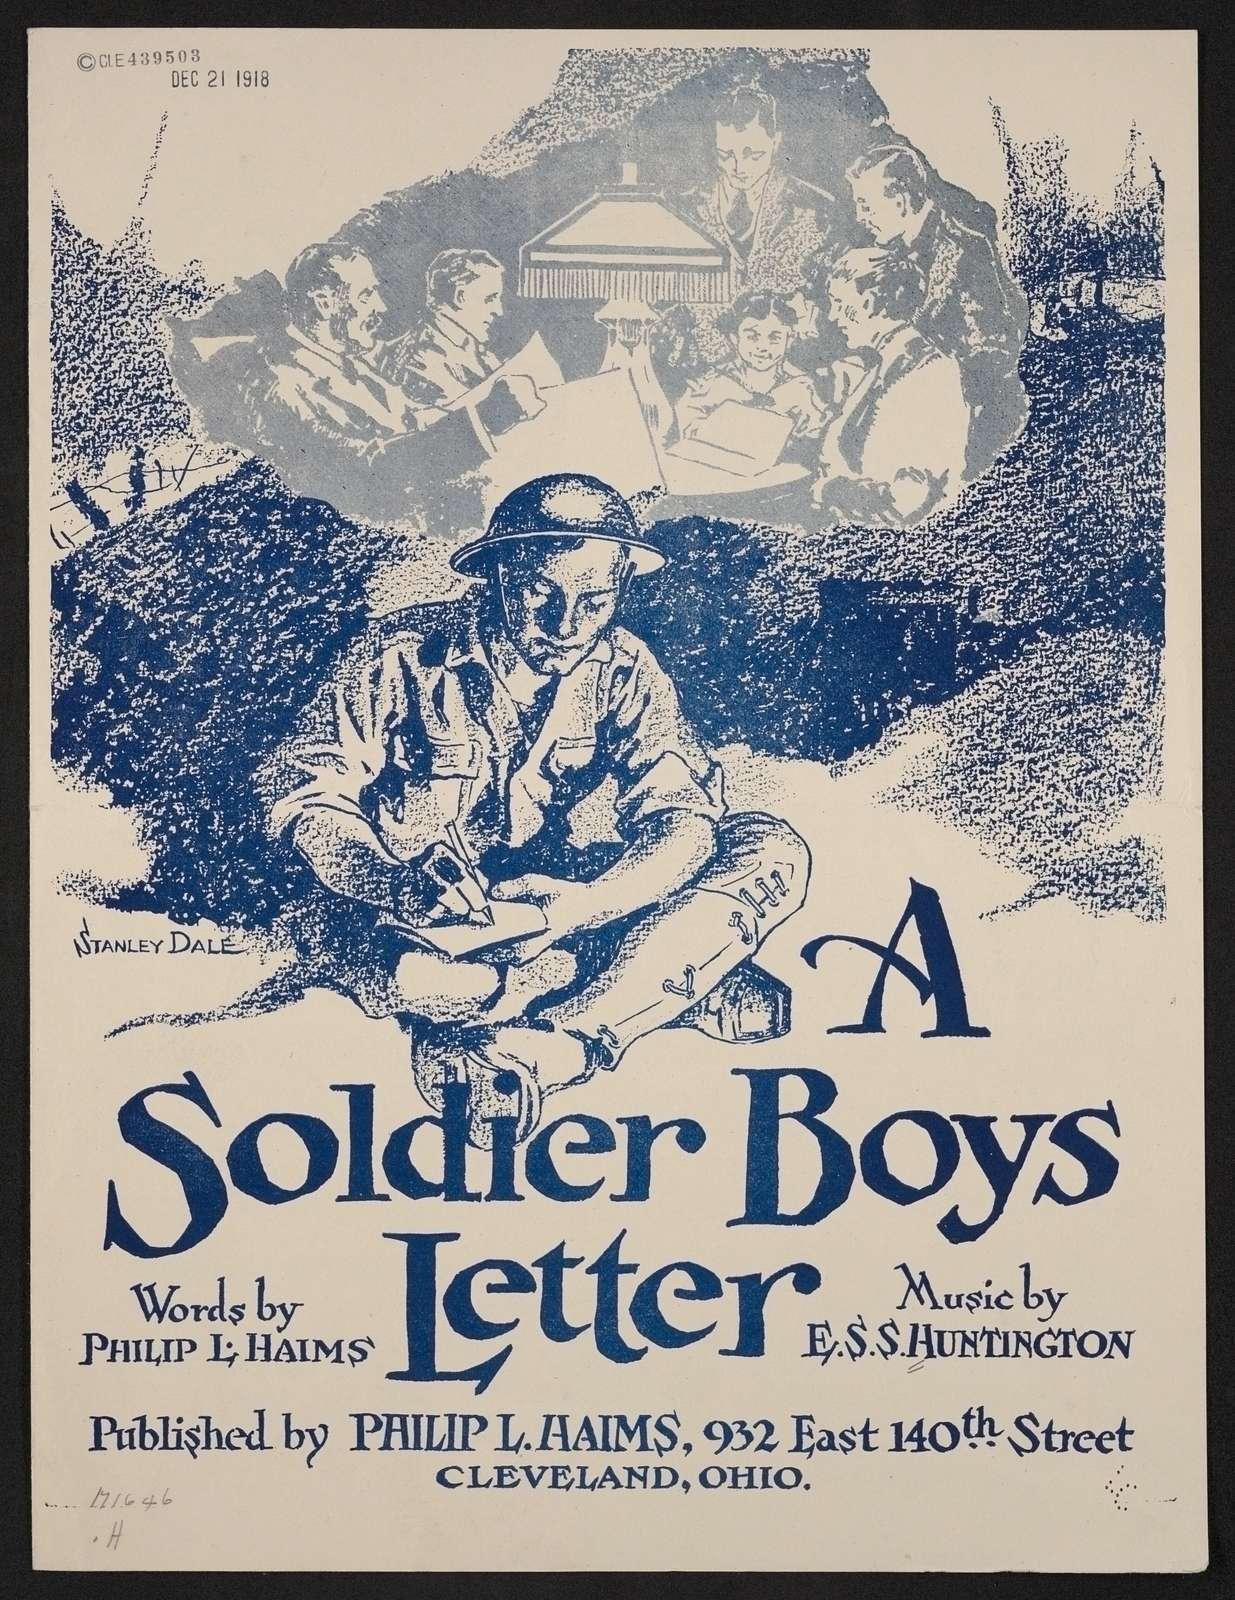 A soldier boys letter